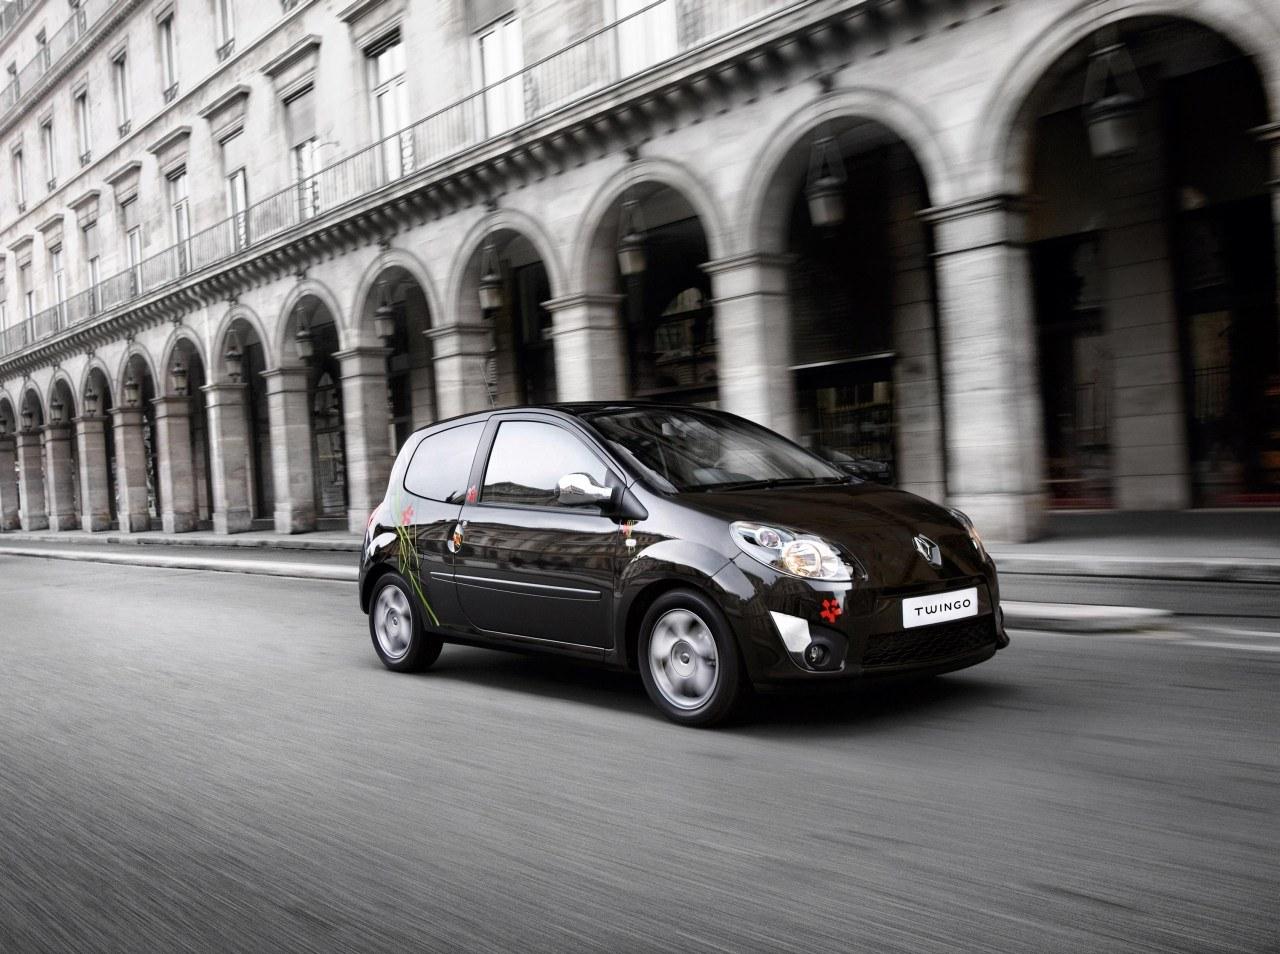 Renault_Twingo_Personalized_01.jpg